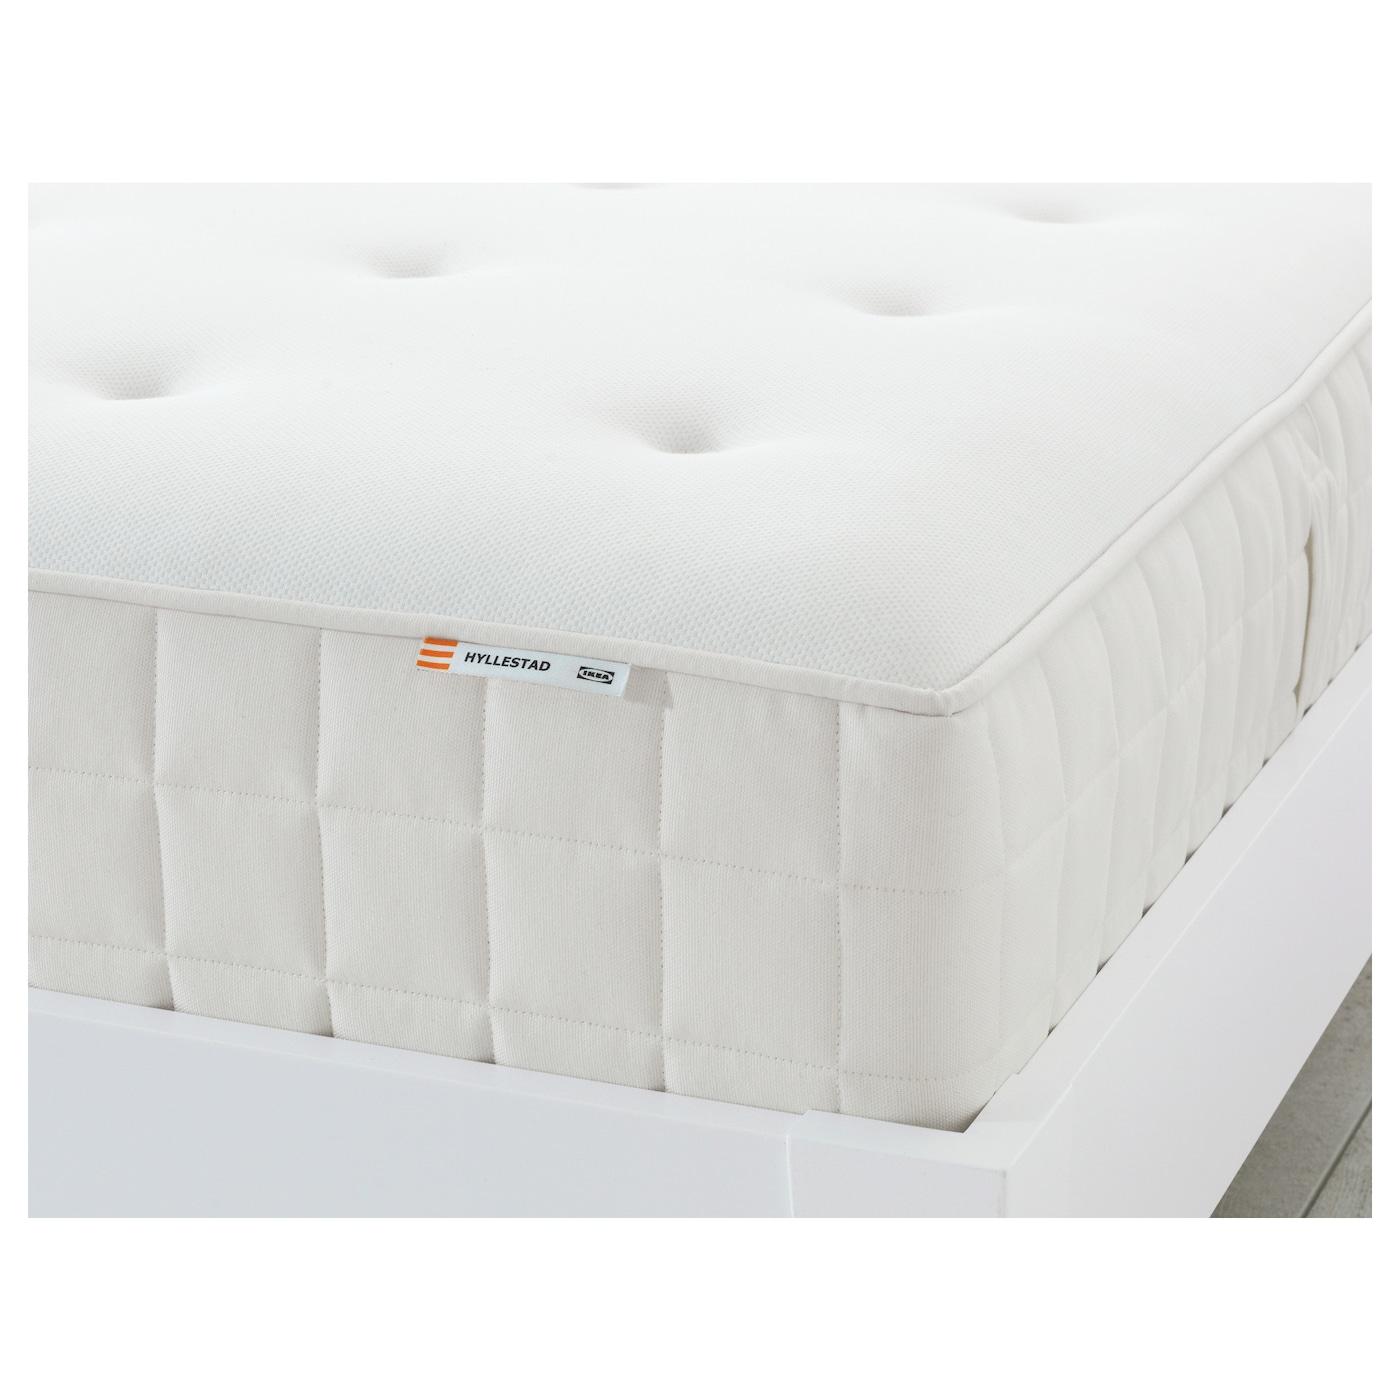 hyllestad matelas ressorts ensach s ferme blanc 90x200 cm ikea. Black Bedroom Furniture Sets. Home Design Ideas